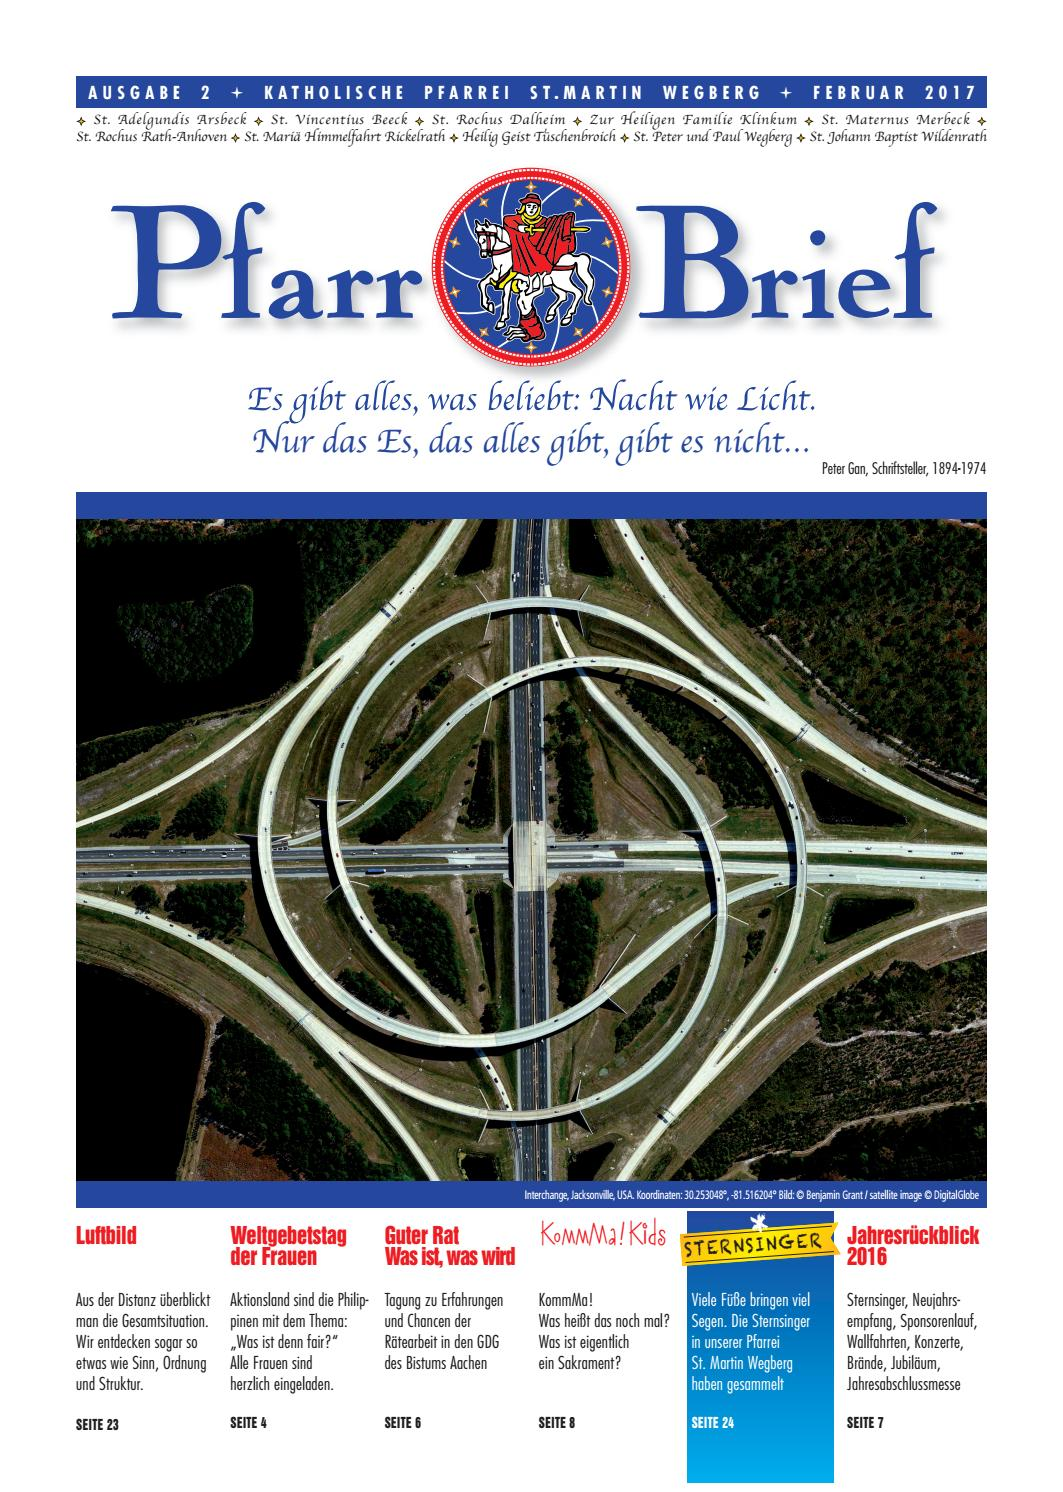 Pfarrbrief St. Martin Wegberg Februar 2017 by Michael Körner - issuu